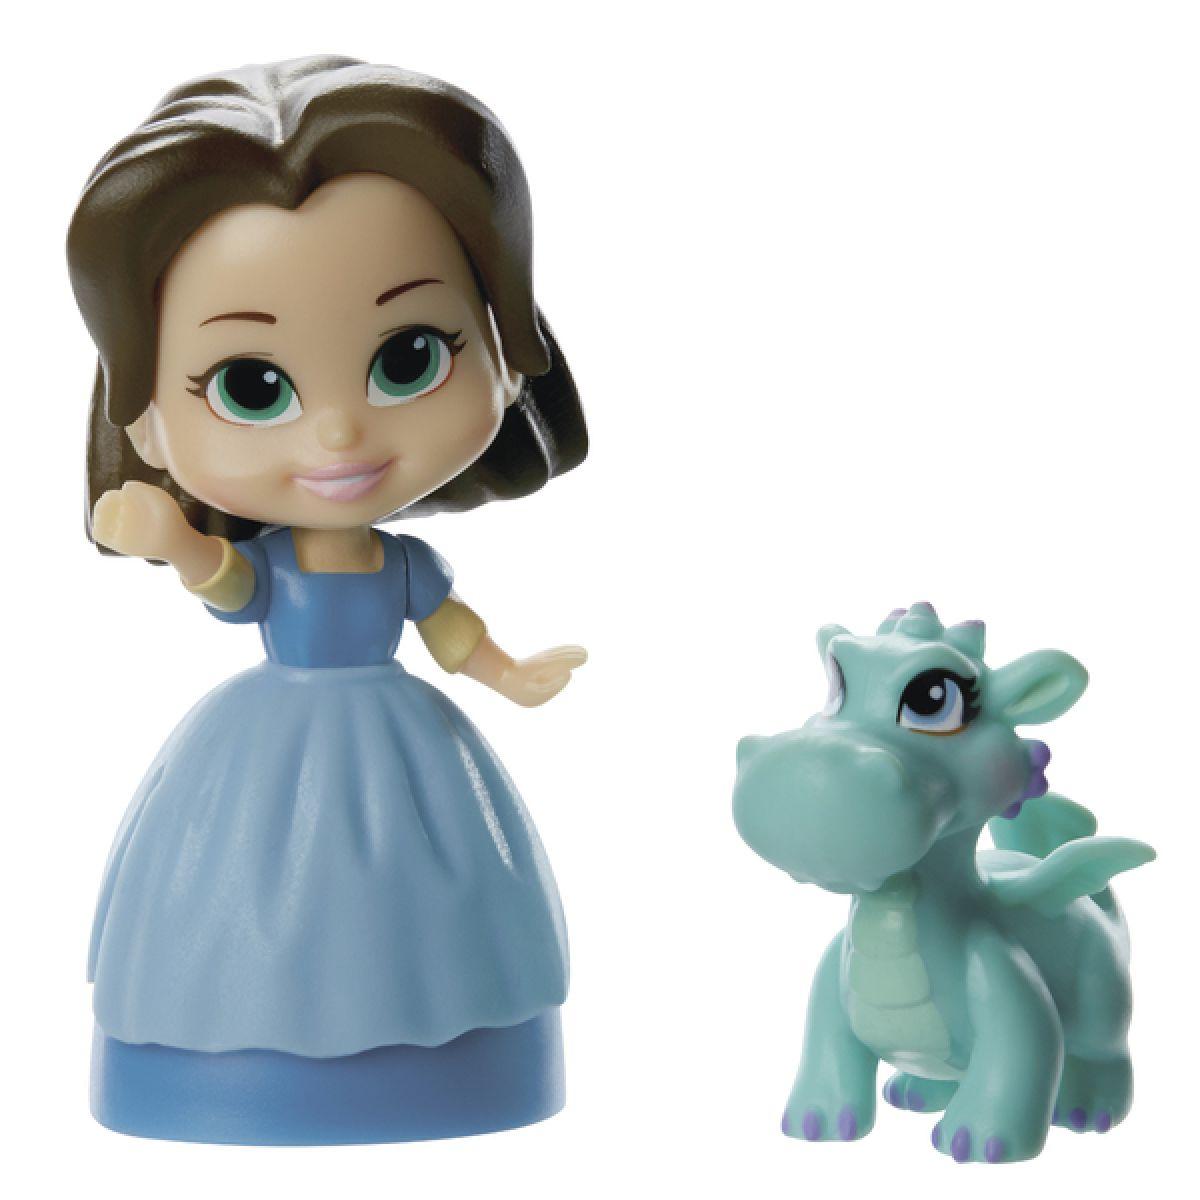 Jakks Pacific Disney Mini princezna a kamarád Jade and Crackle